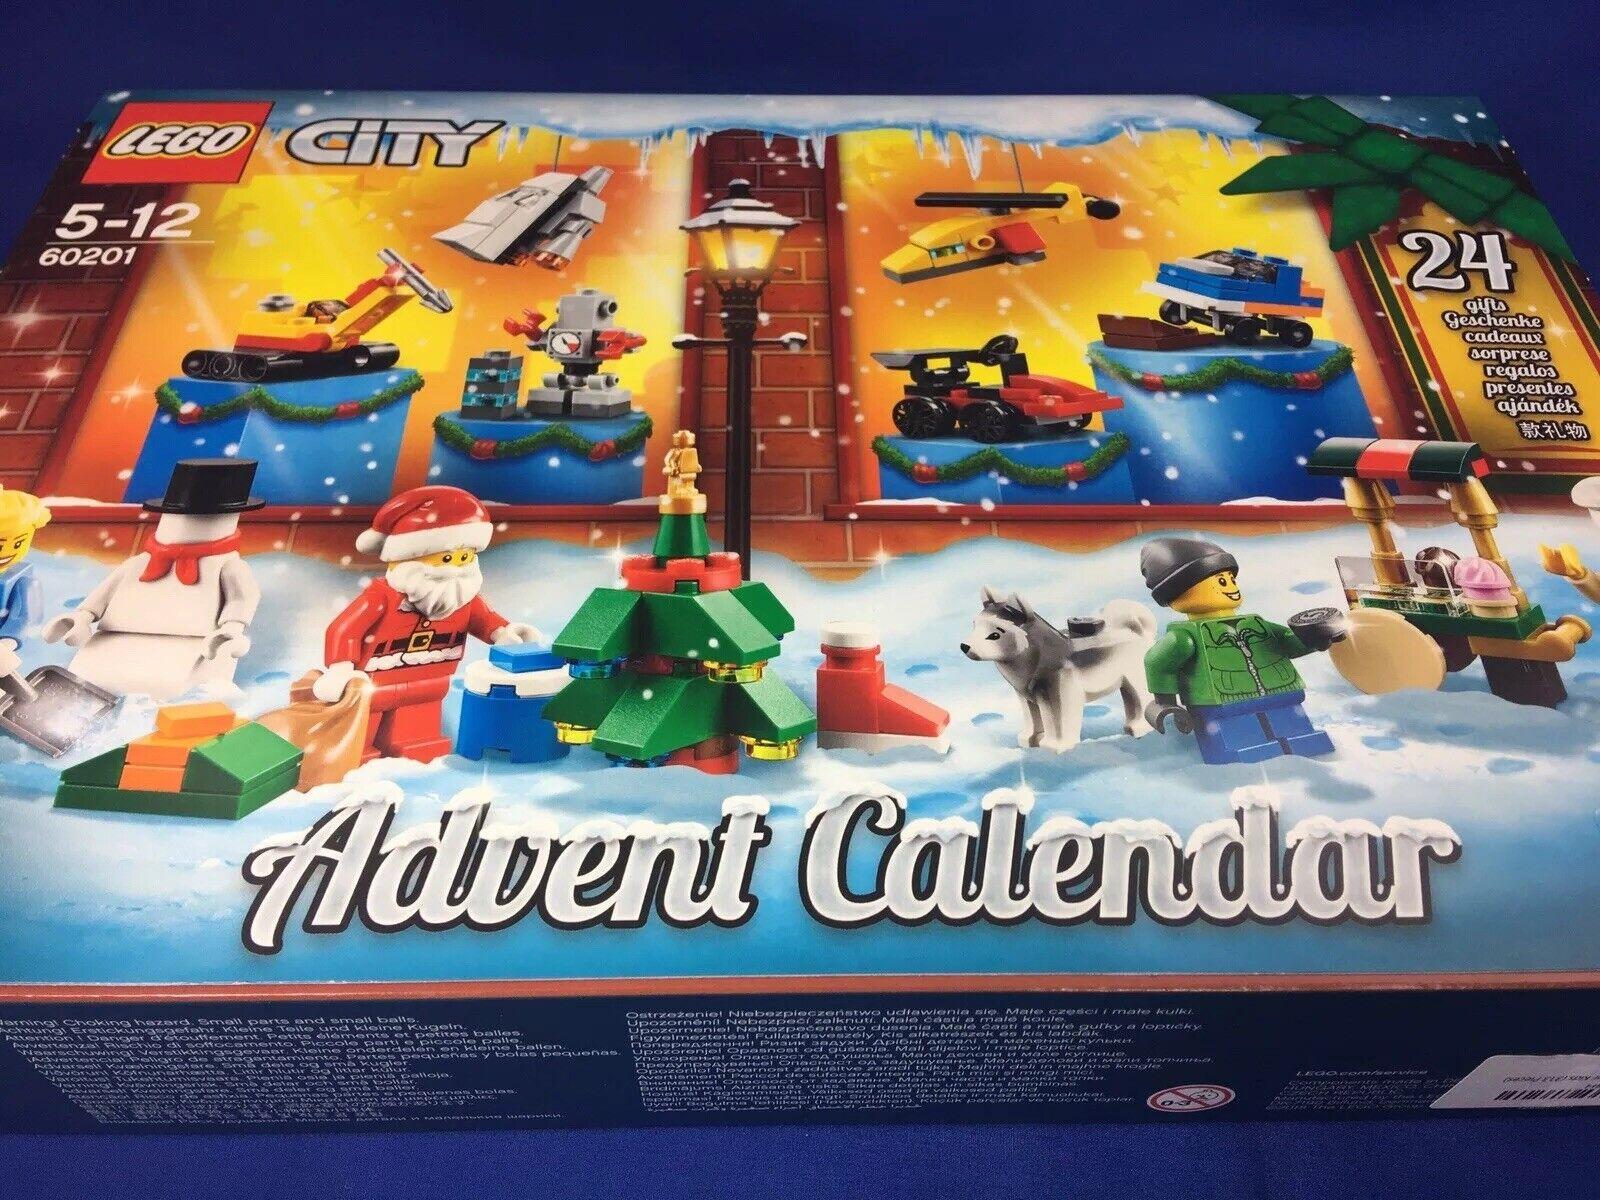 LEGO LEGO LEGO City Advent Calendar 60201, New 2018 Edition, Minifigures Small Buildings dbdd7f